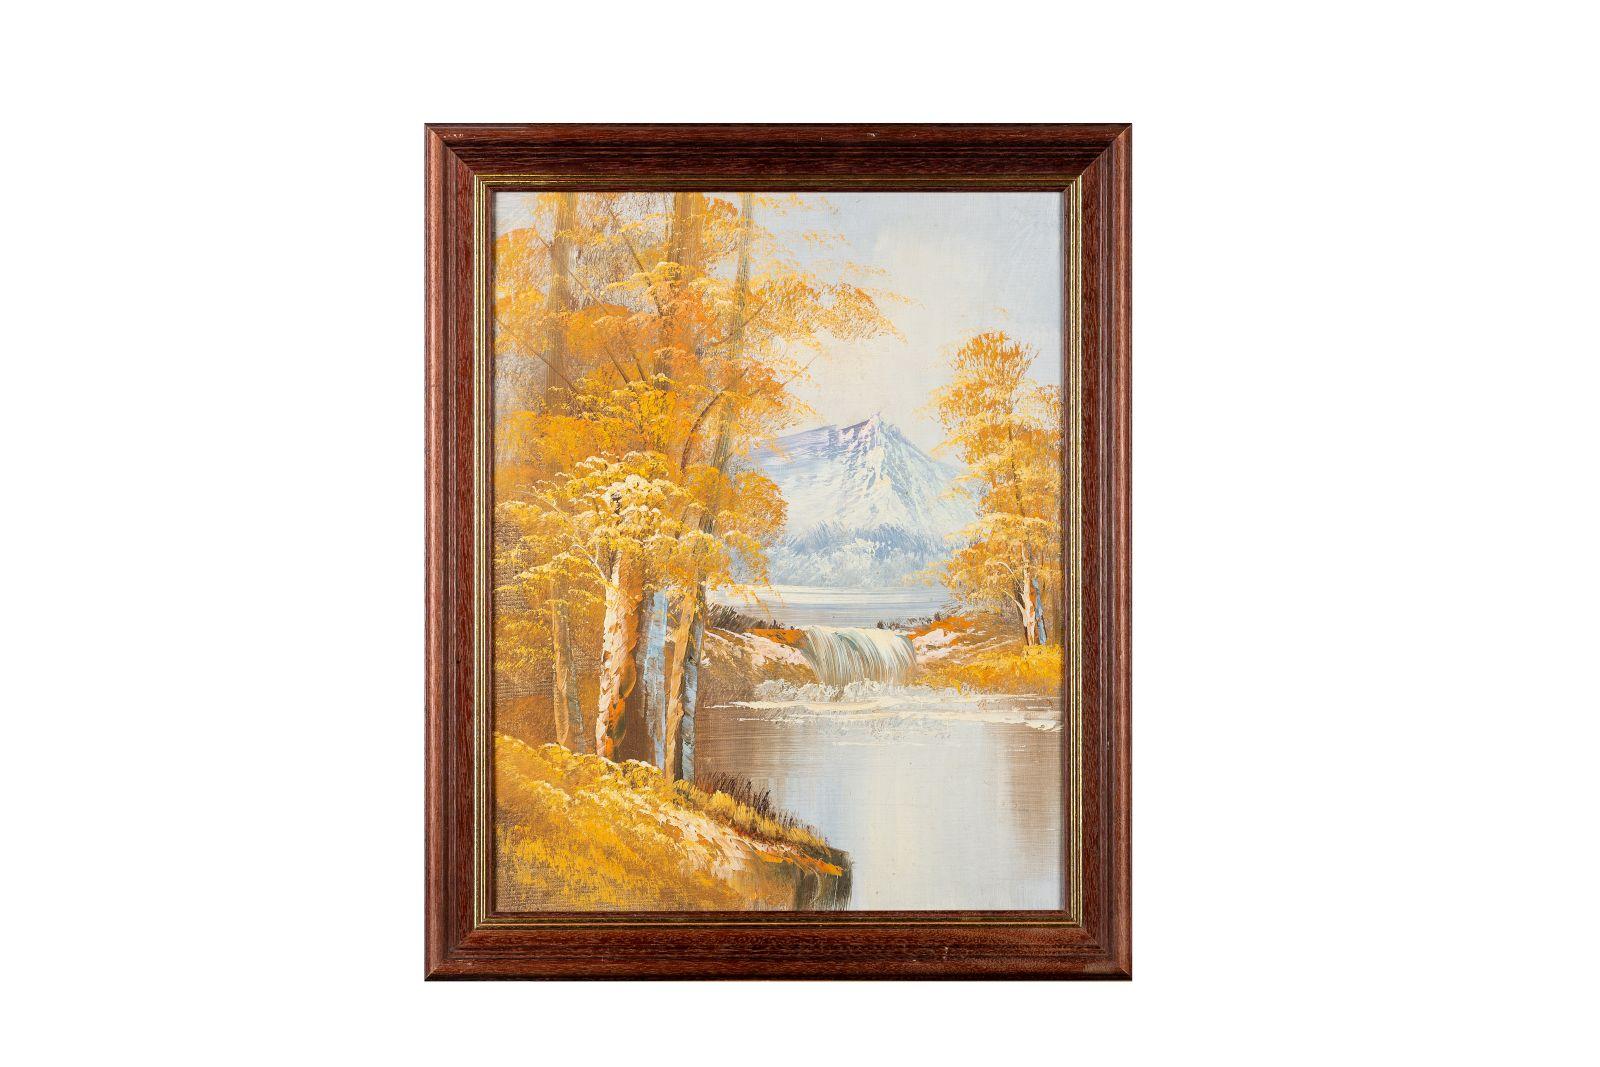 #10 Decorative oil painting | Dekoratives Ölbild Image